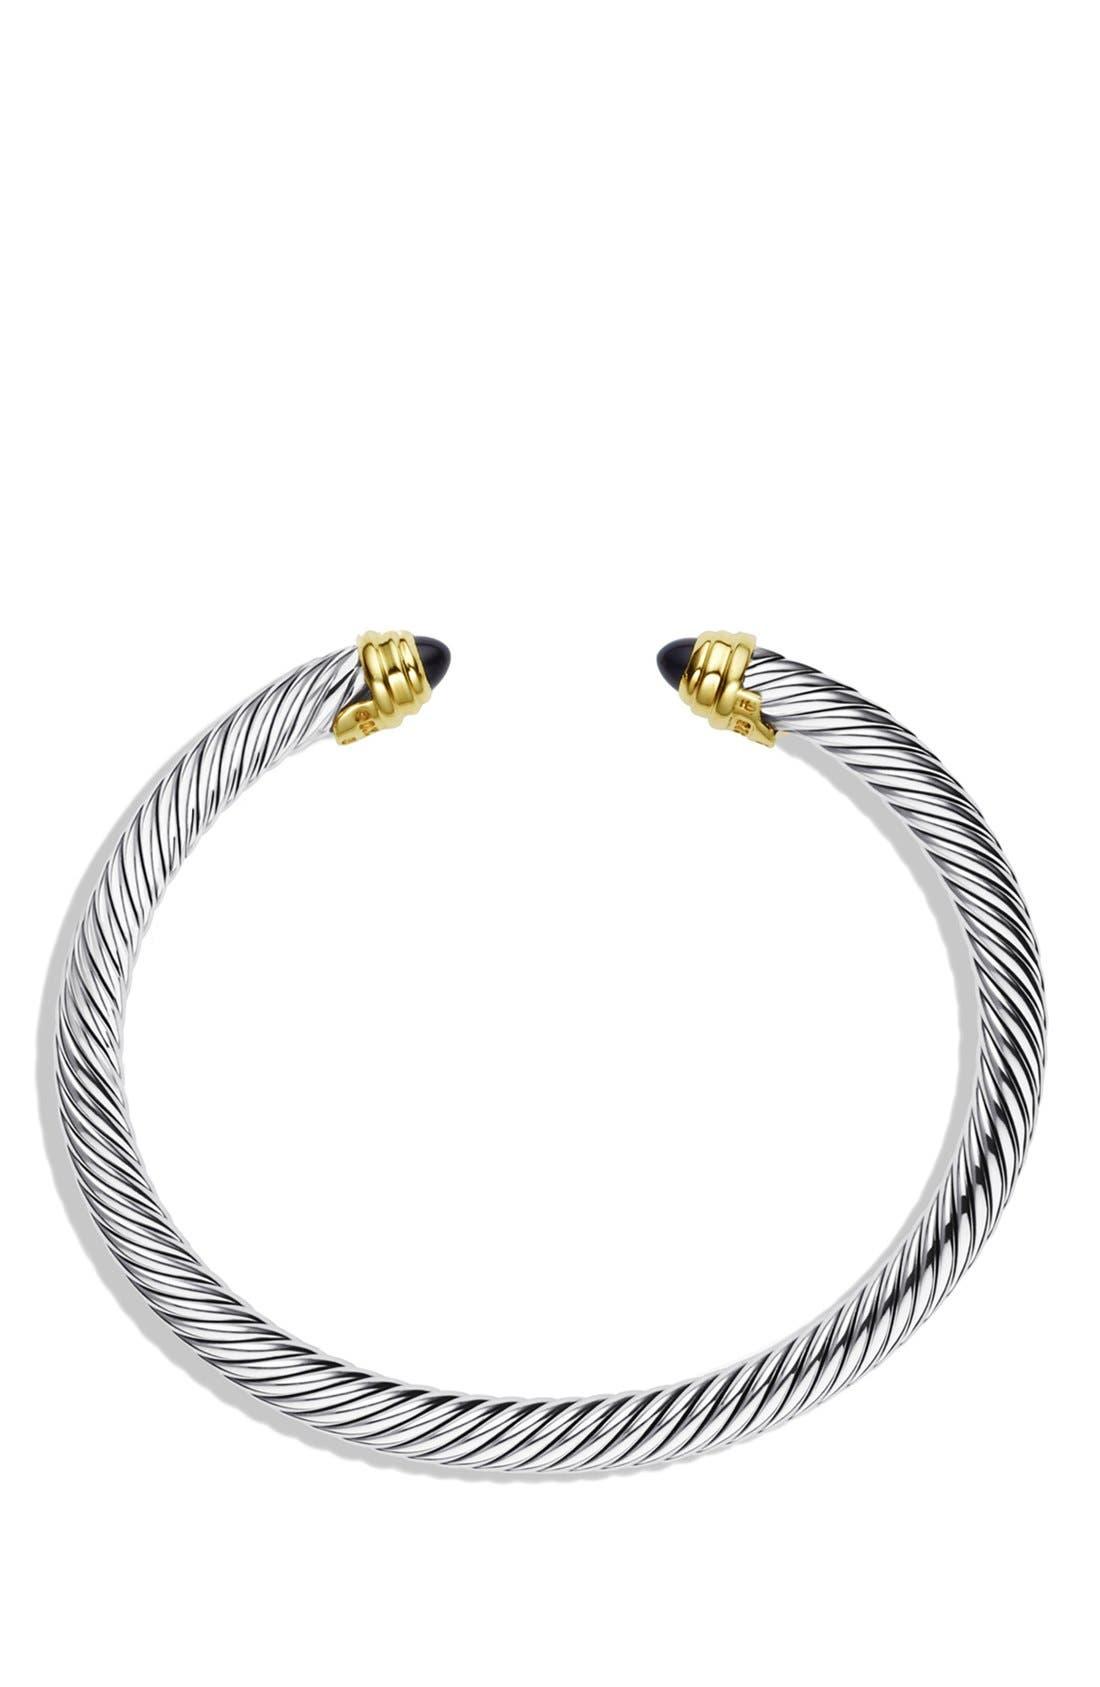 DAVID YURMAN, Cable Classics Bracelet with Semiprecious Stones & 14K Gold, 5mm, Alternate thumbnail 3, color, BLACK ONYX